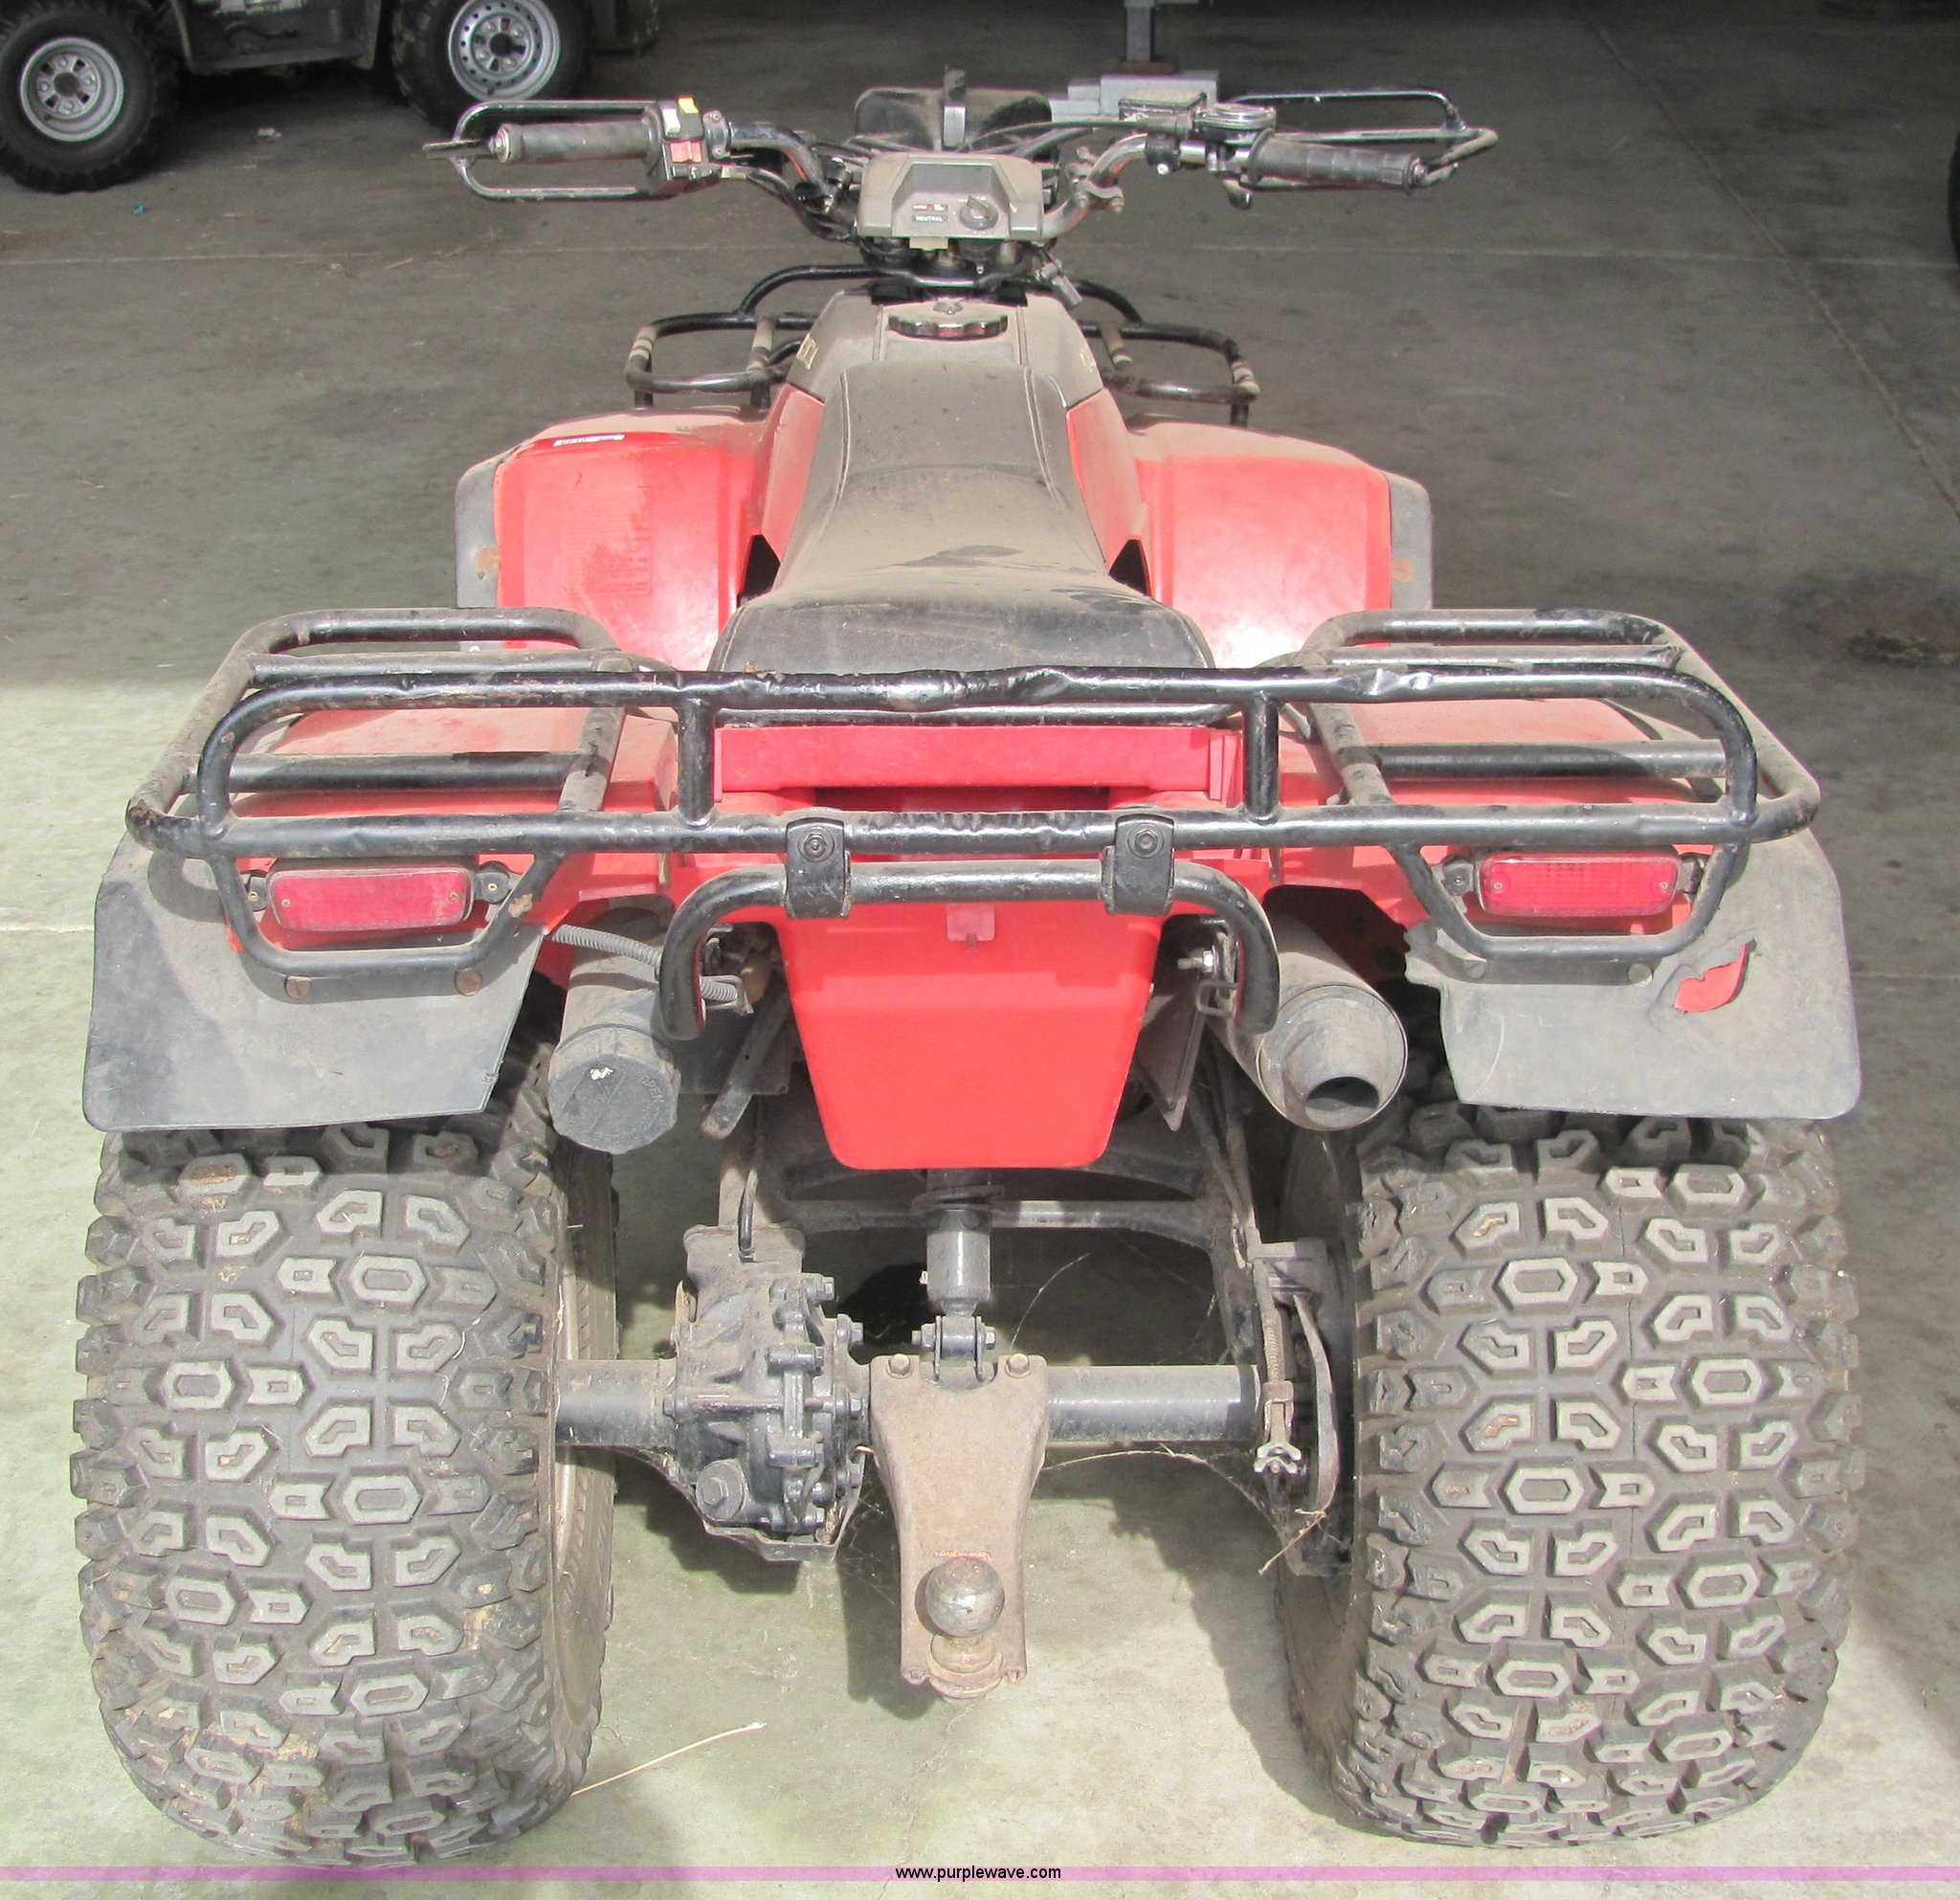 1987 Honda TRX250 ATV Full Size In New Window